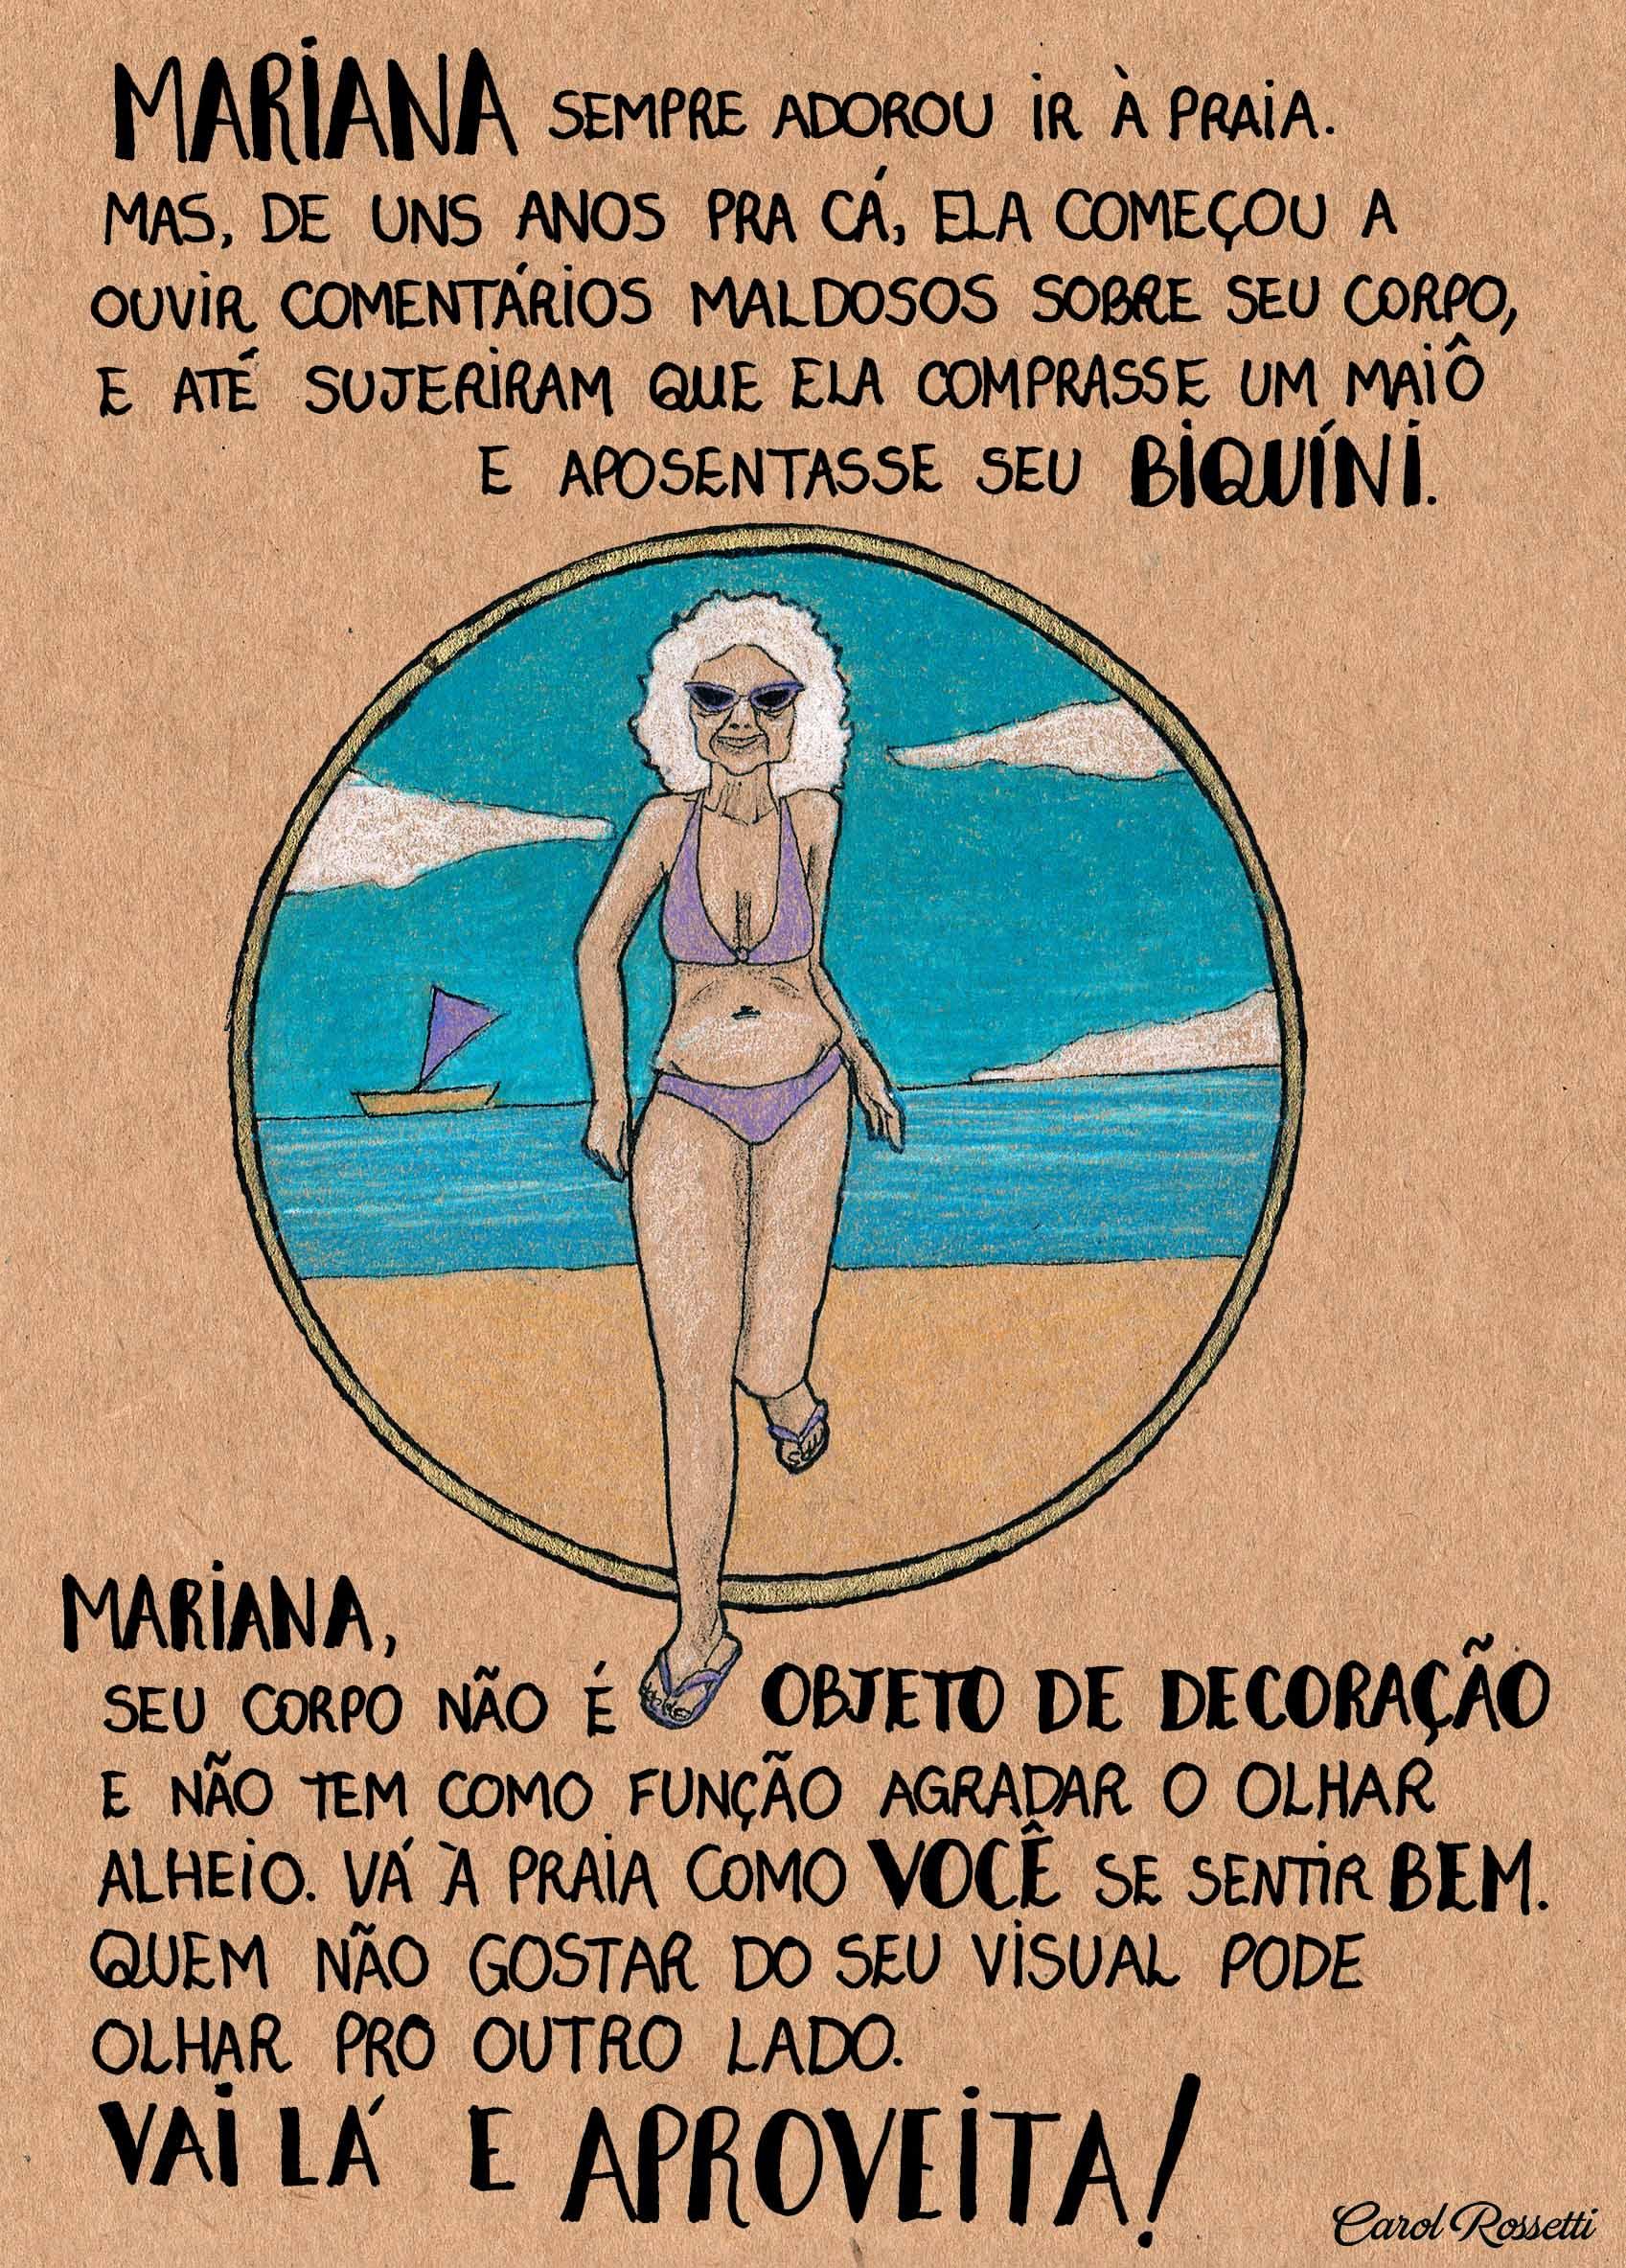 CR_MARIANA.jpg